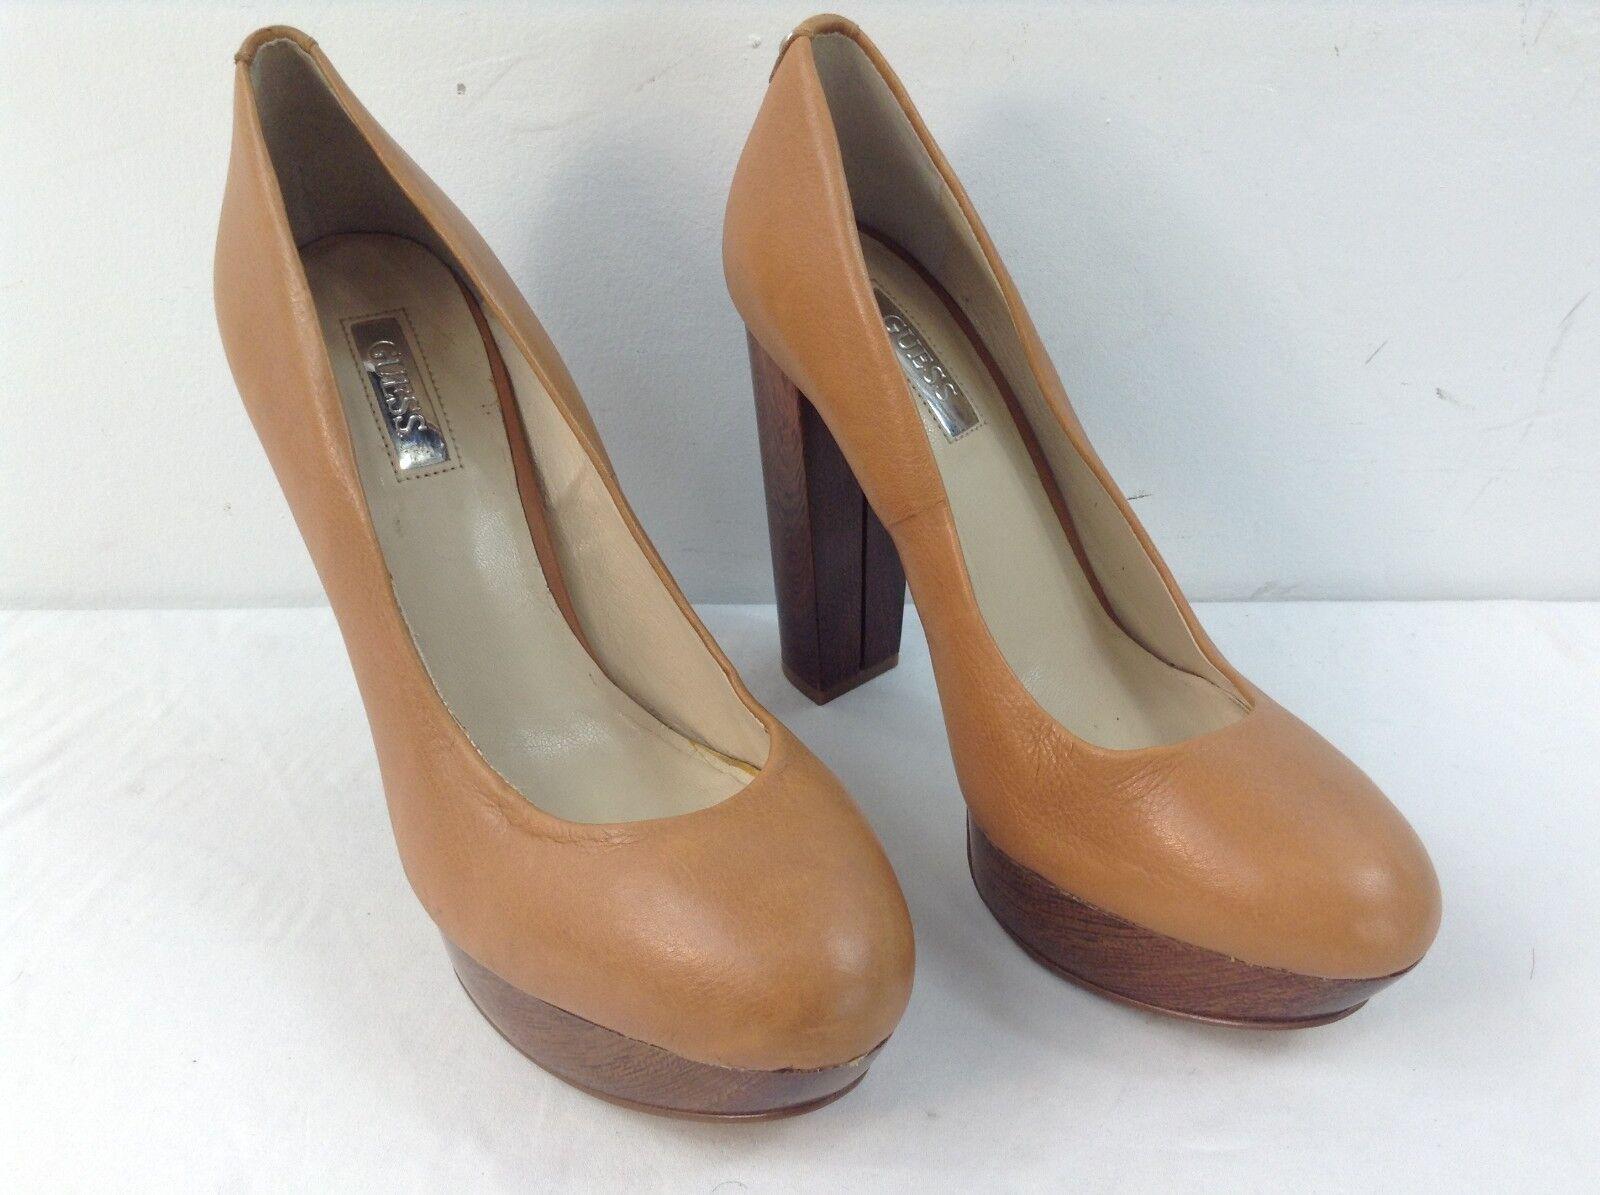 Guess High Heel Pumps Tan Leather Size 6.5M Dark Wood Tone Heel Platform